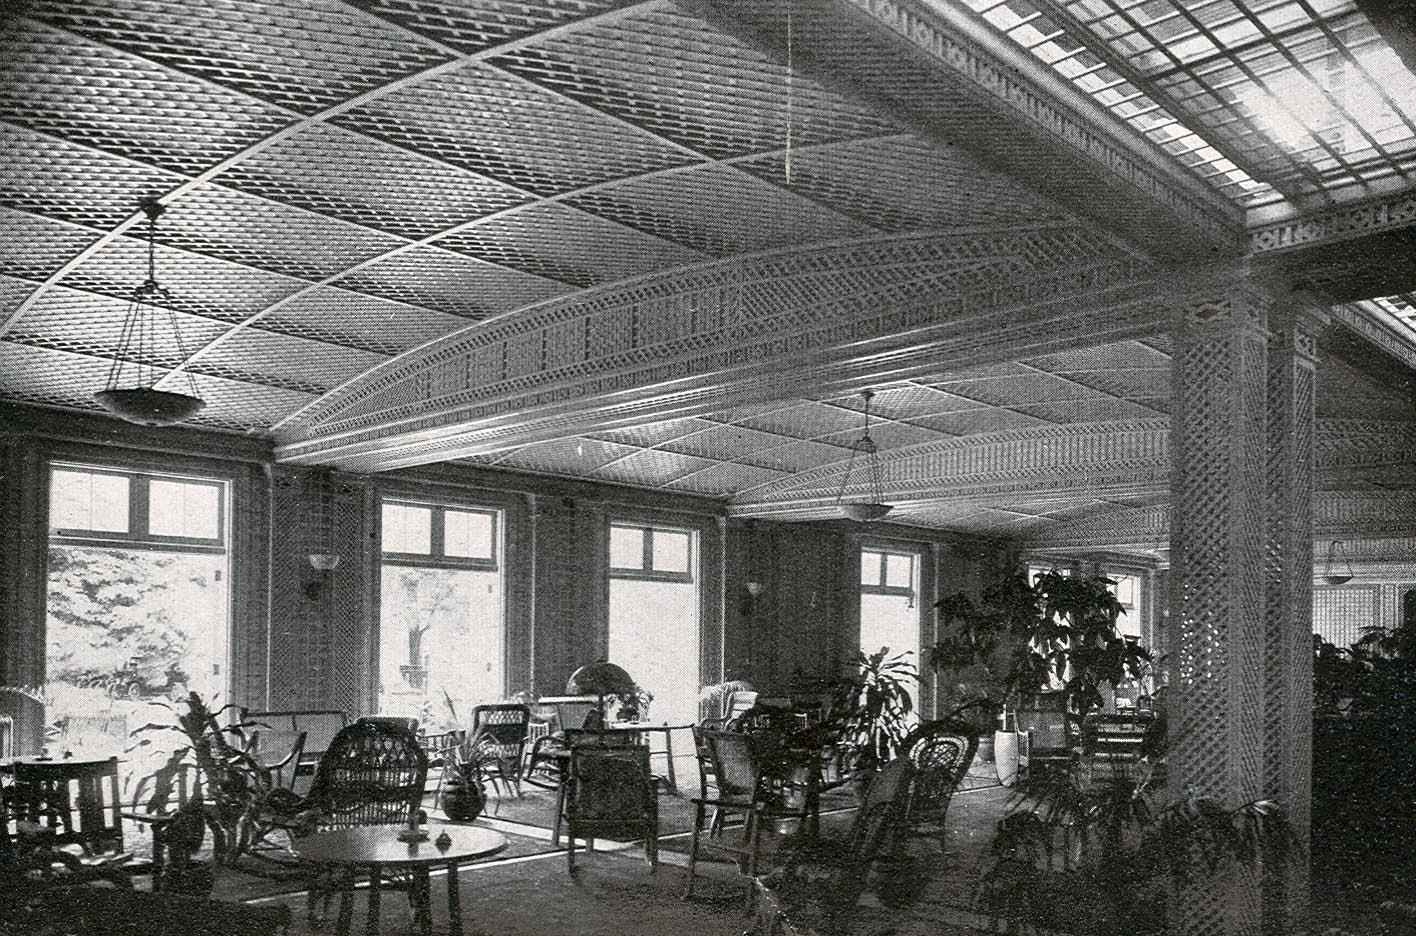 Vanderbilt cup races blog the garden city hotel in 1913 for Hotels on motor parkway long island